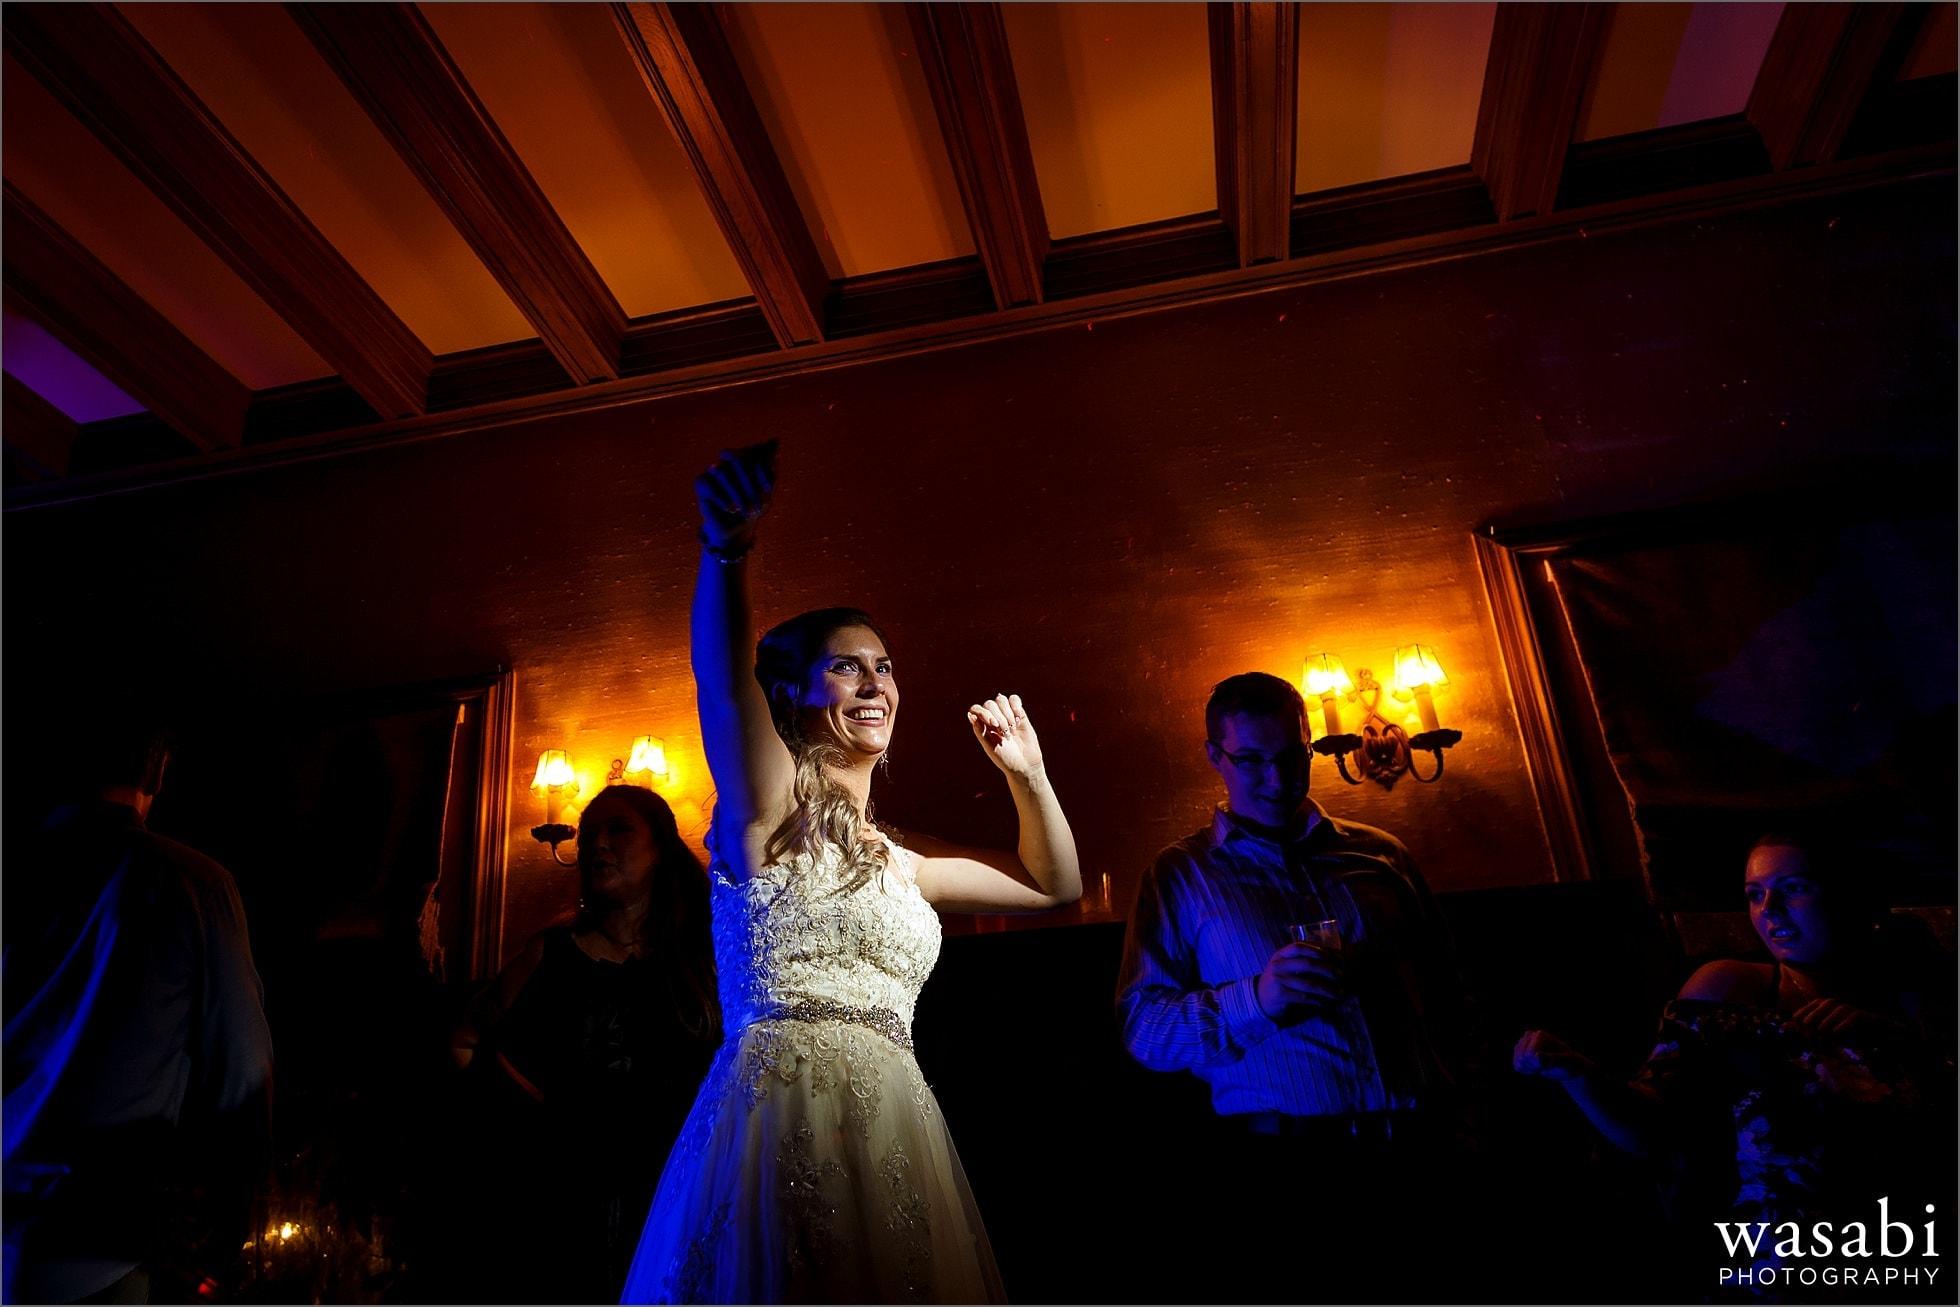 hard light bride dancing photo during wedding reception at Cheney Mansion in Oak Park